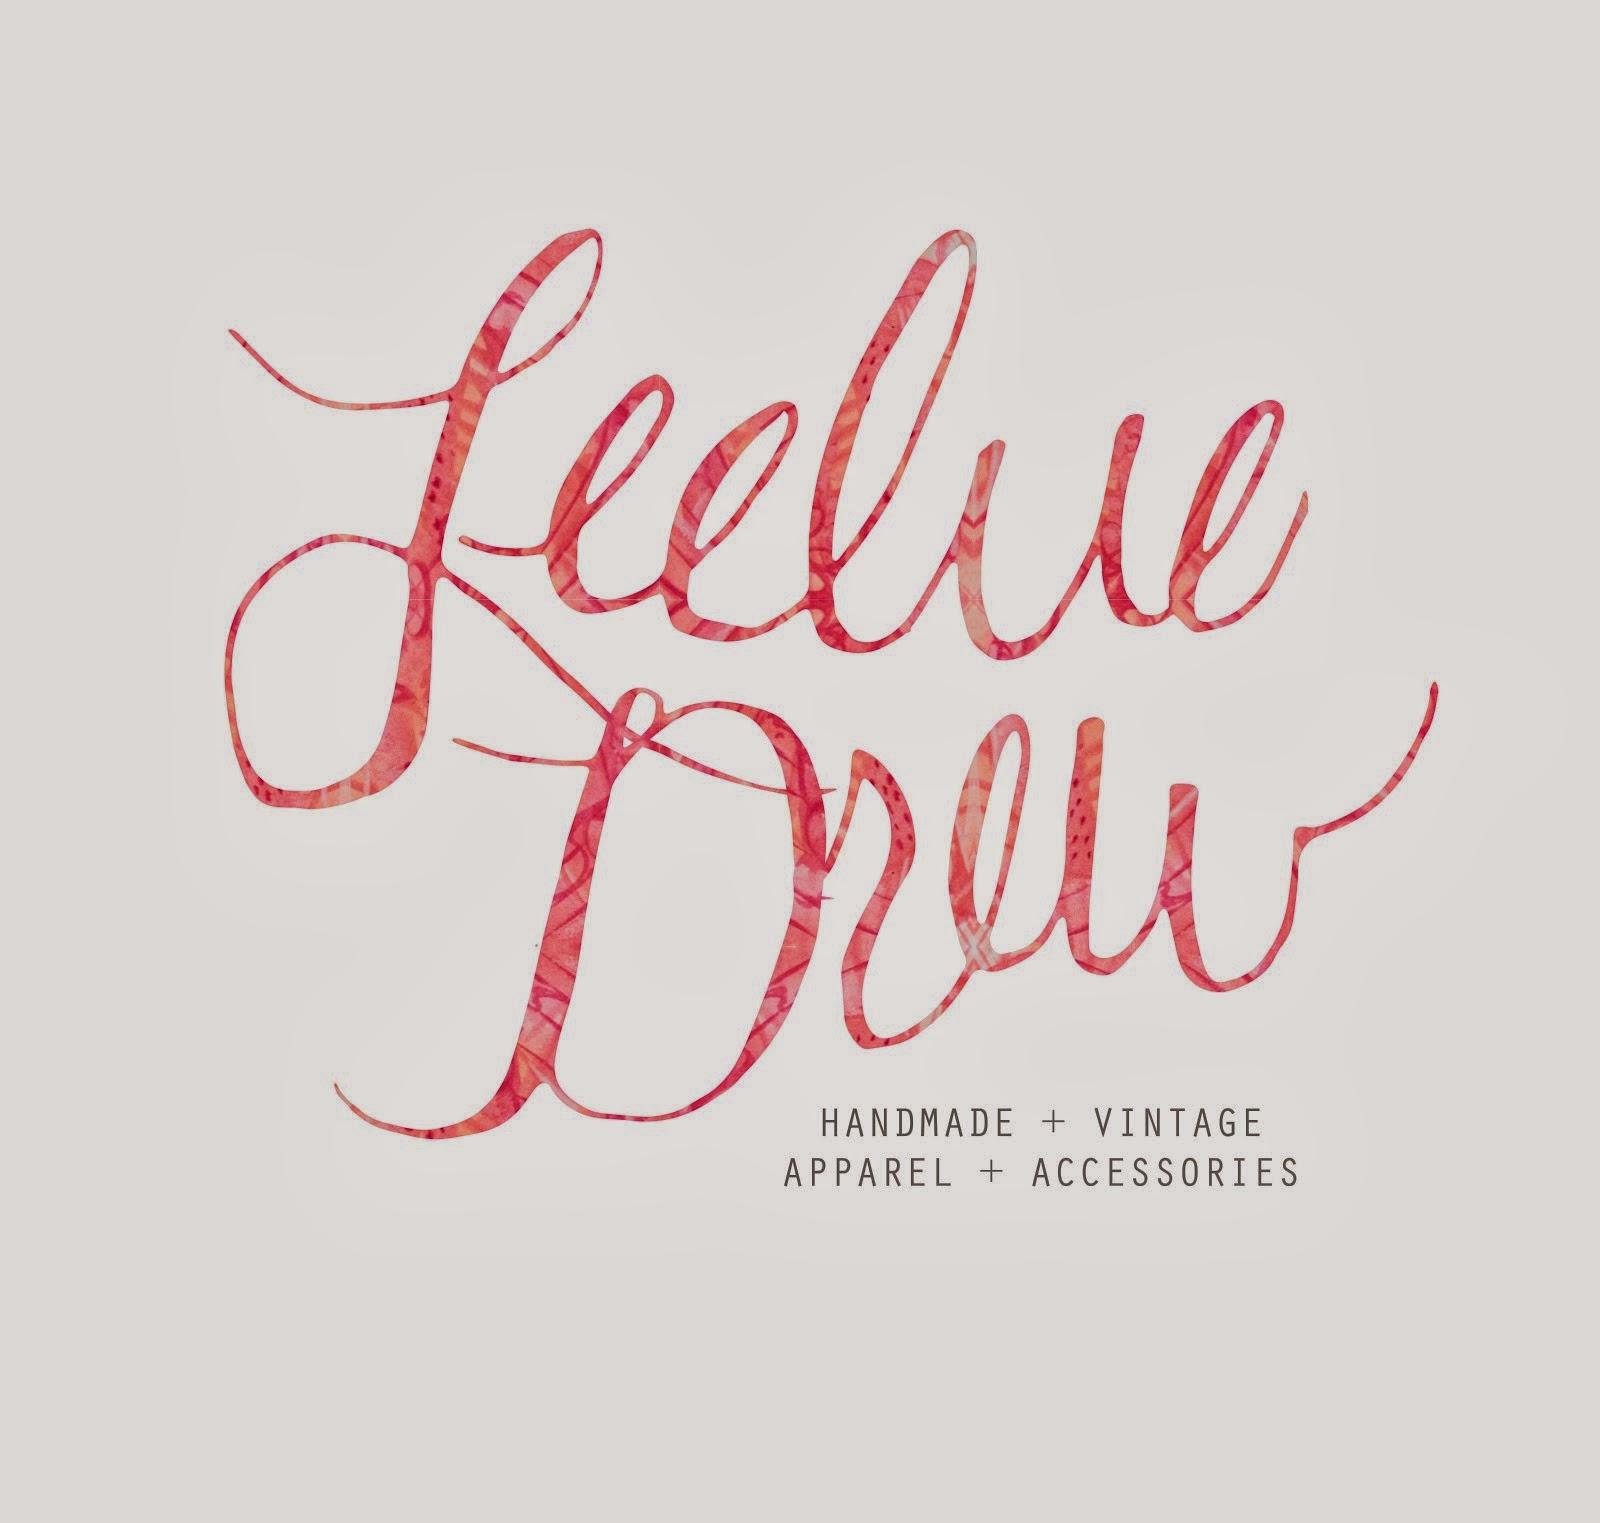 Leelue Drew